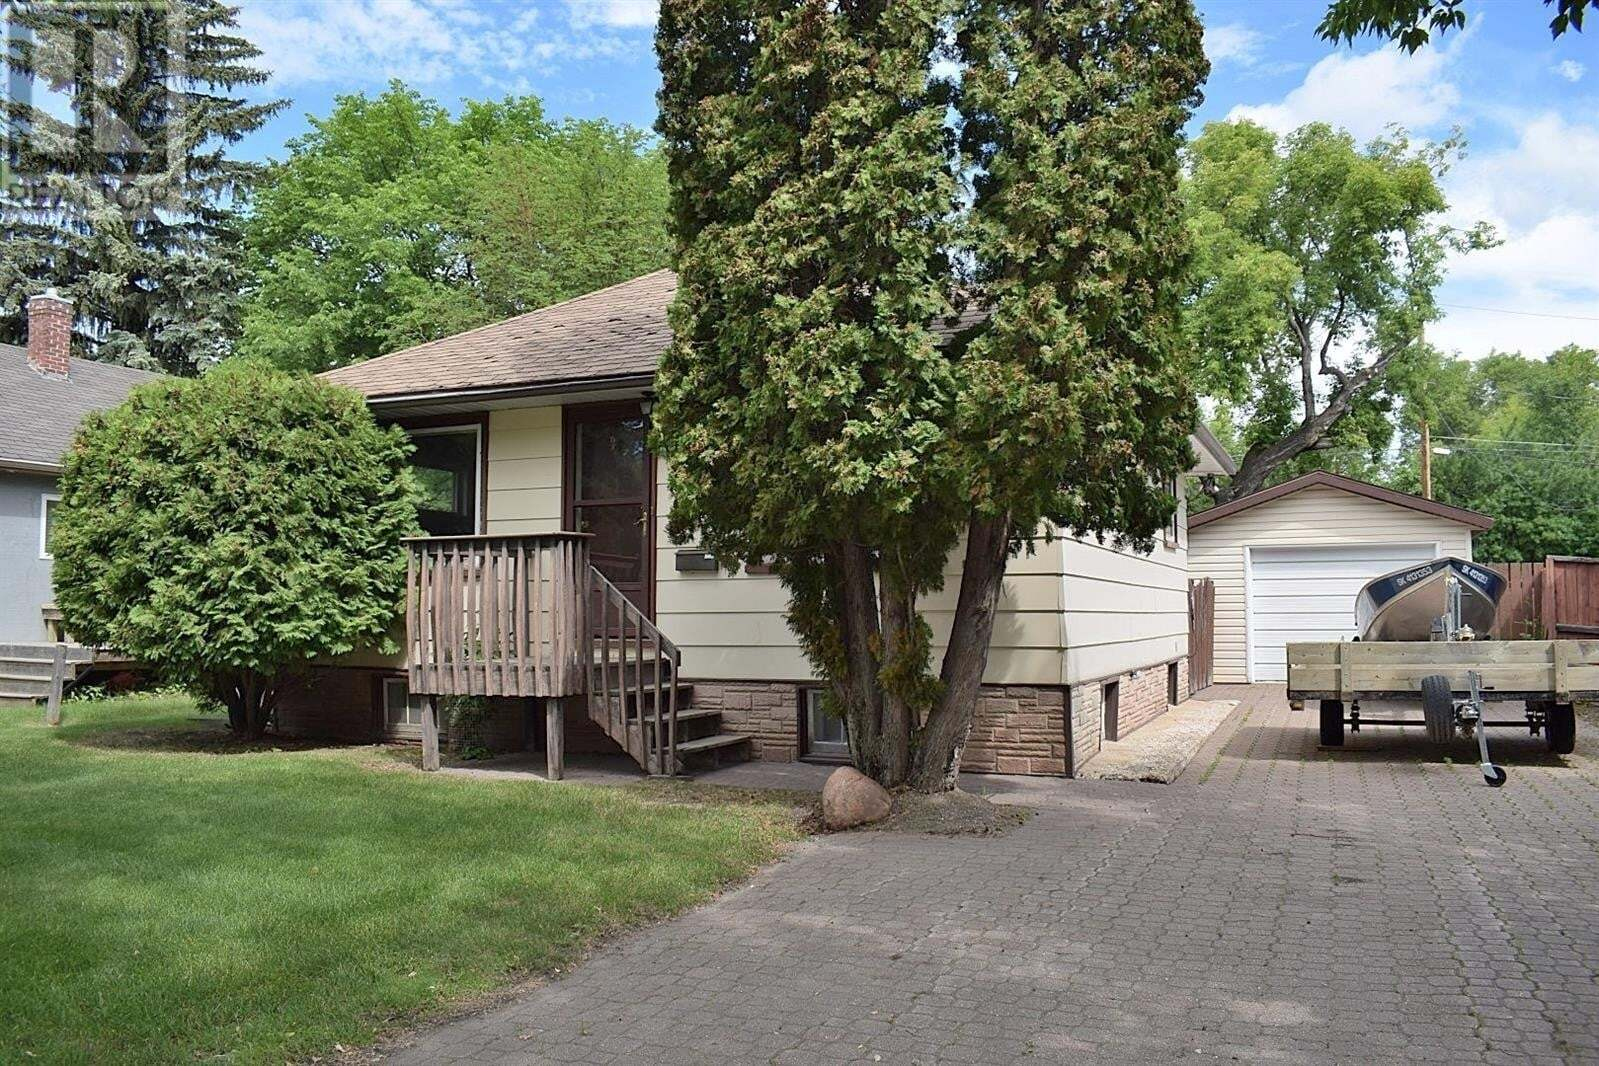 House for sale at 10 26th St E Prince Albert Saskatchewan - MLS: SK826553